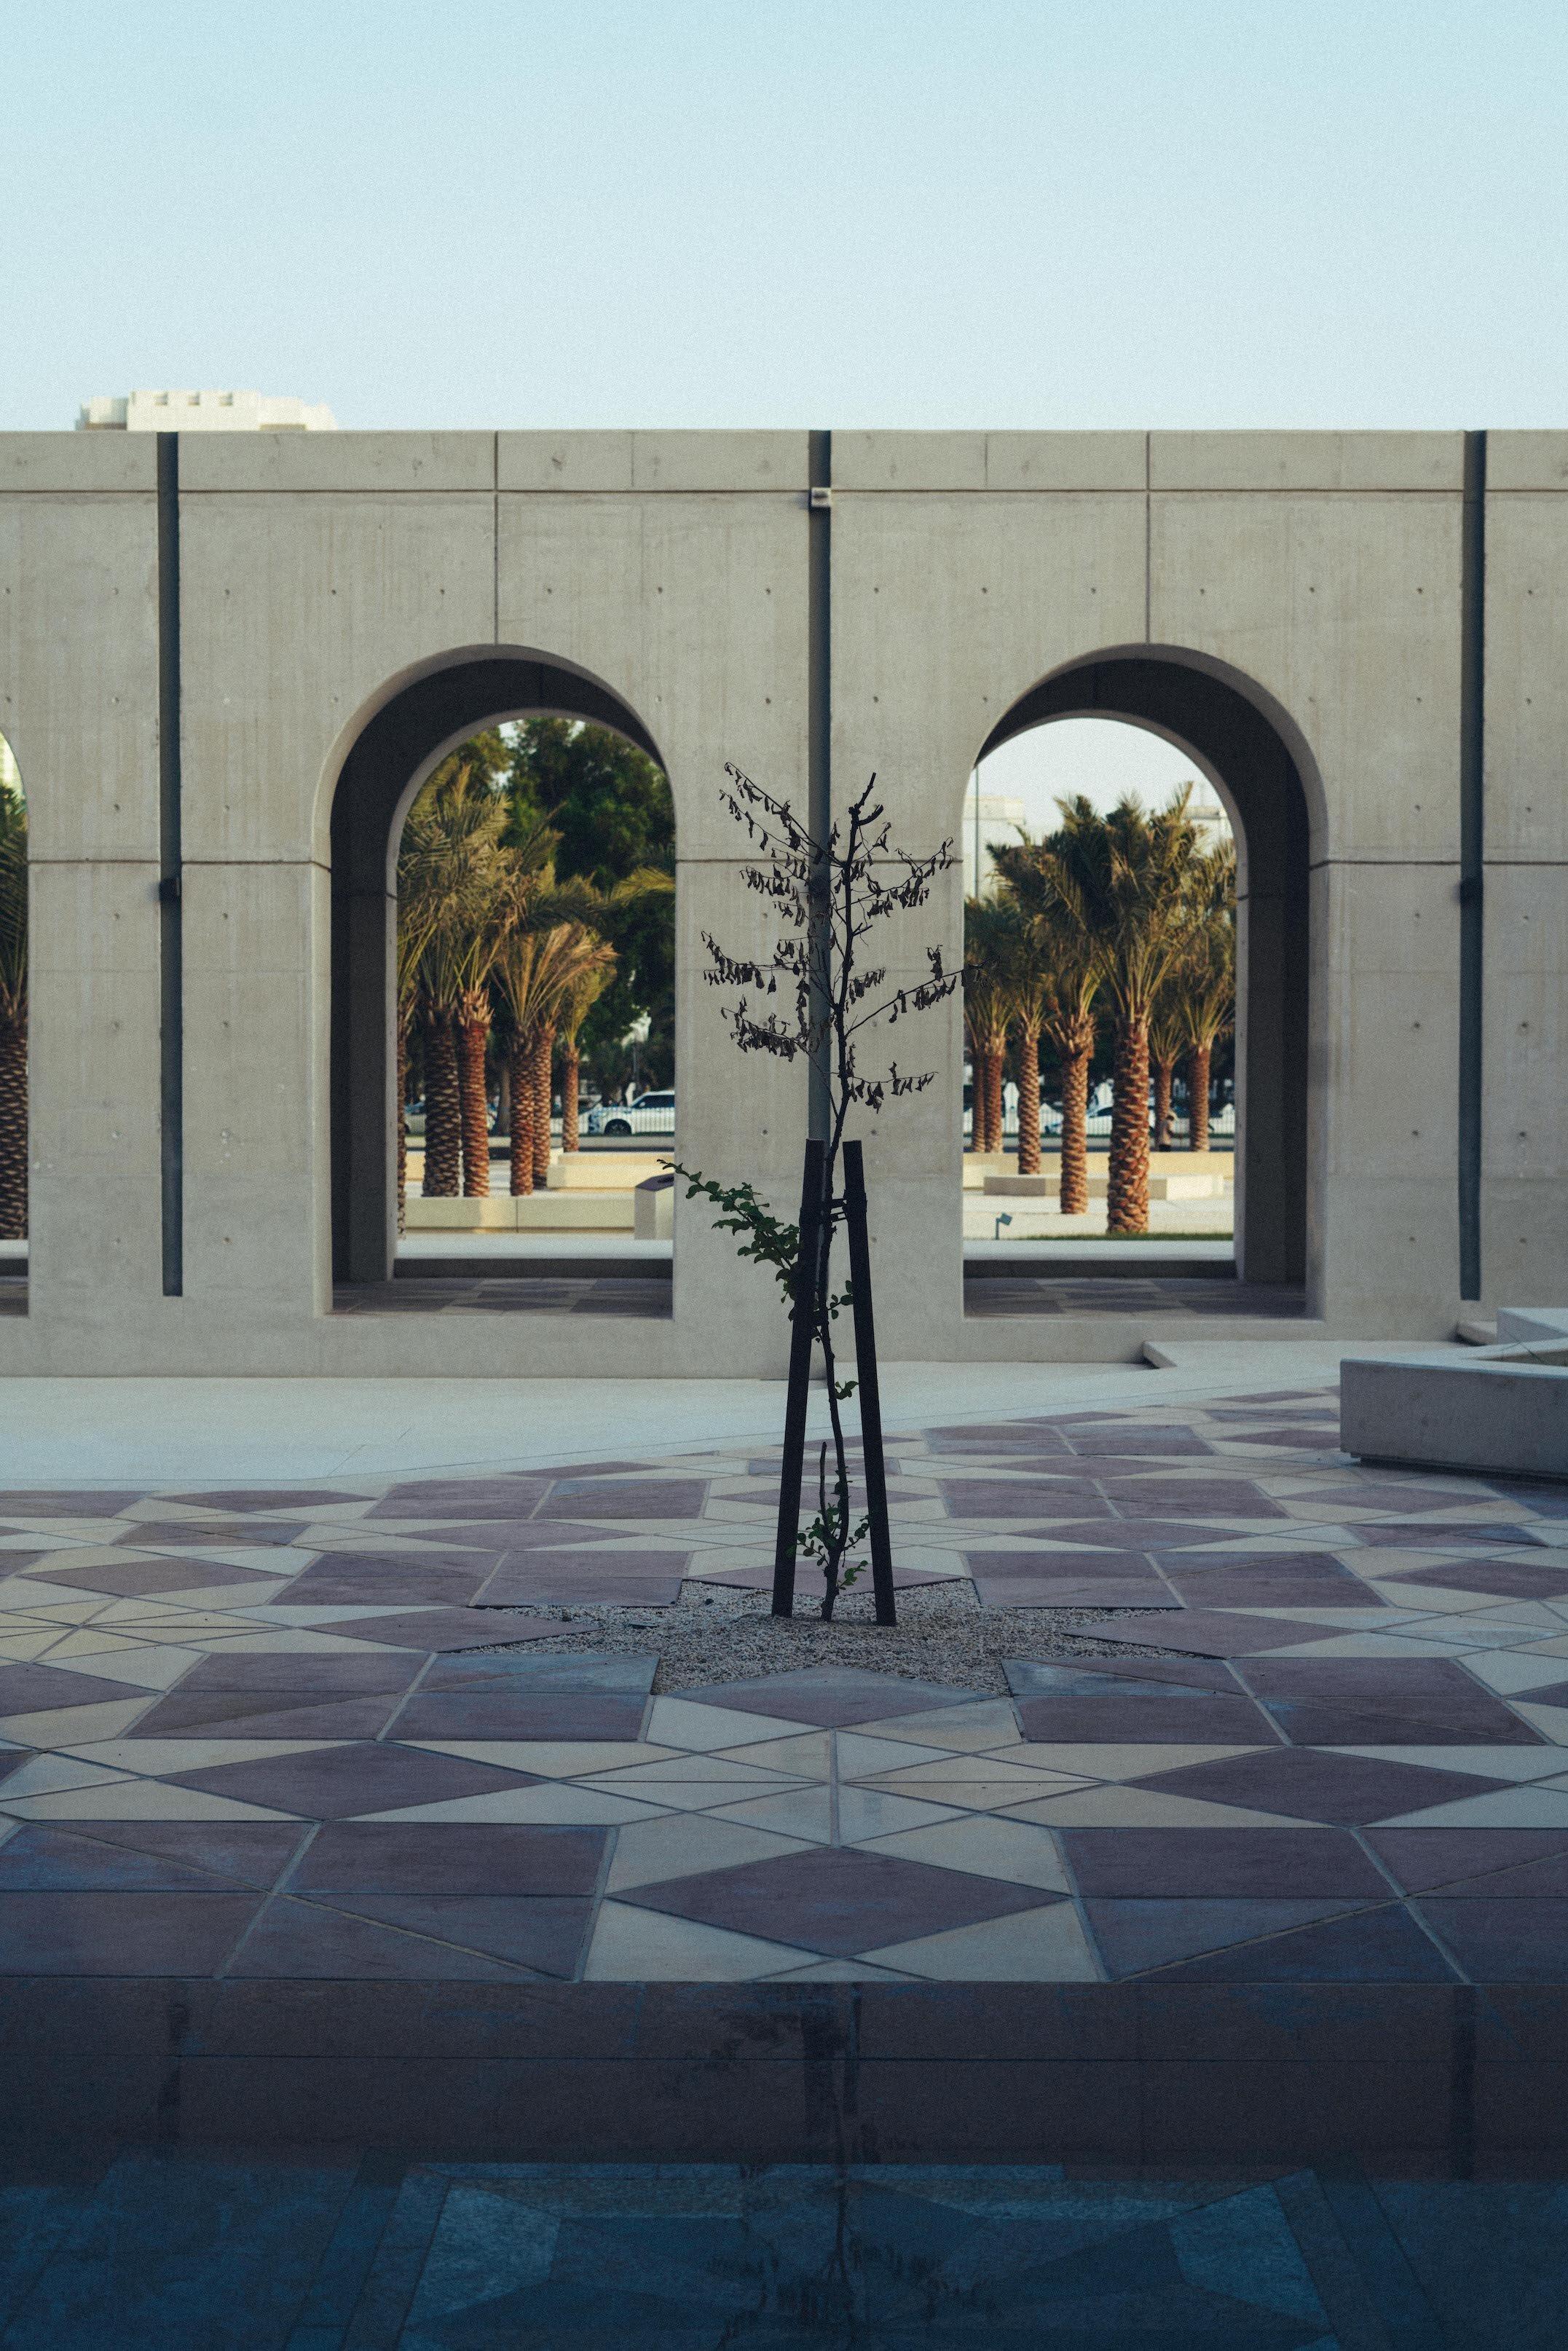 Qasr Al Hosn tree